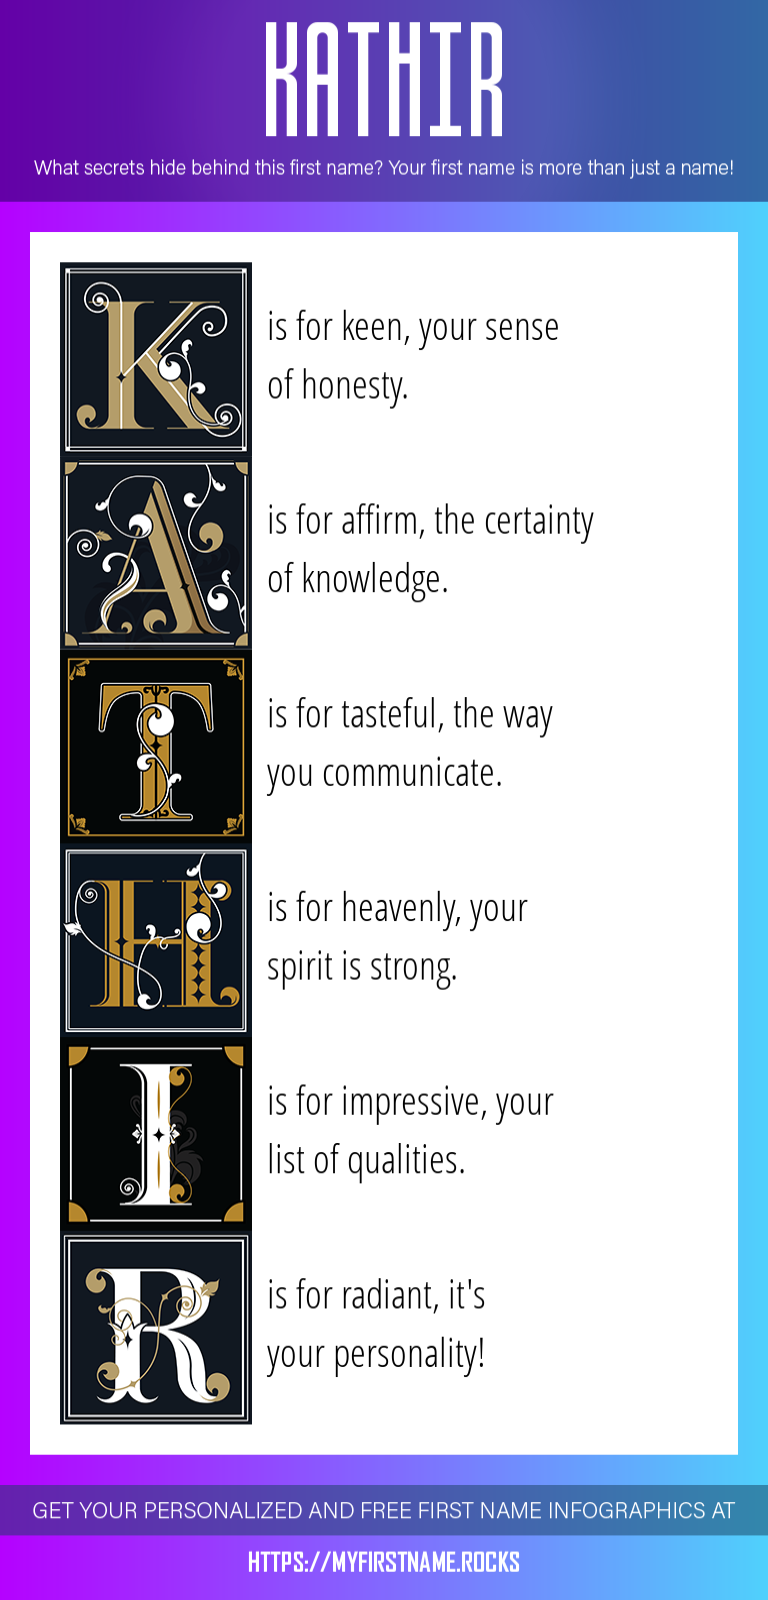 Kathir Infographics